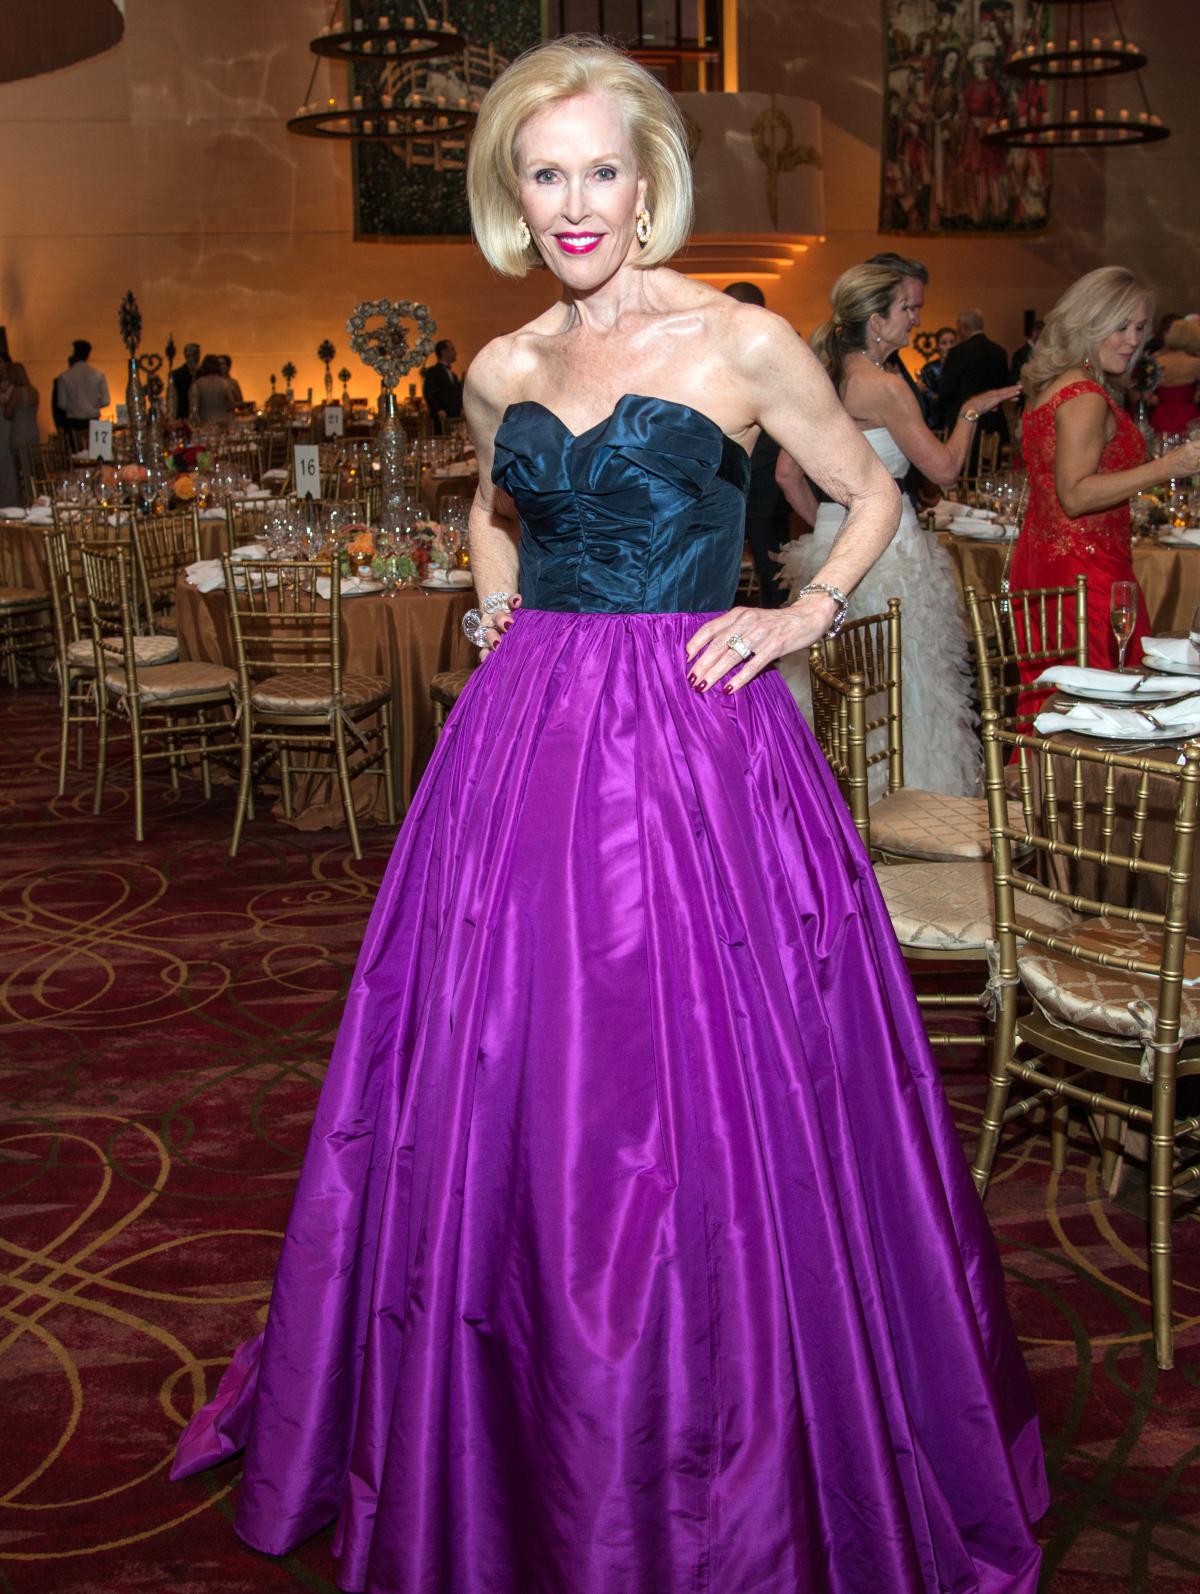 Houston, Ballet Ball gowns, Feb 2017, Claudia Hatcher in Oscar de la Renta